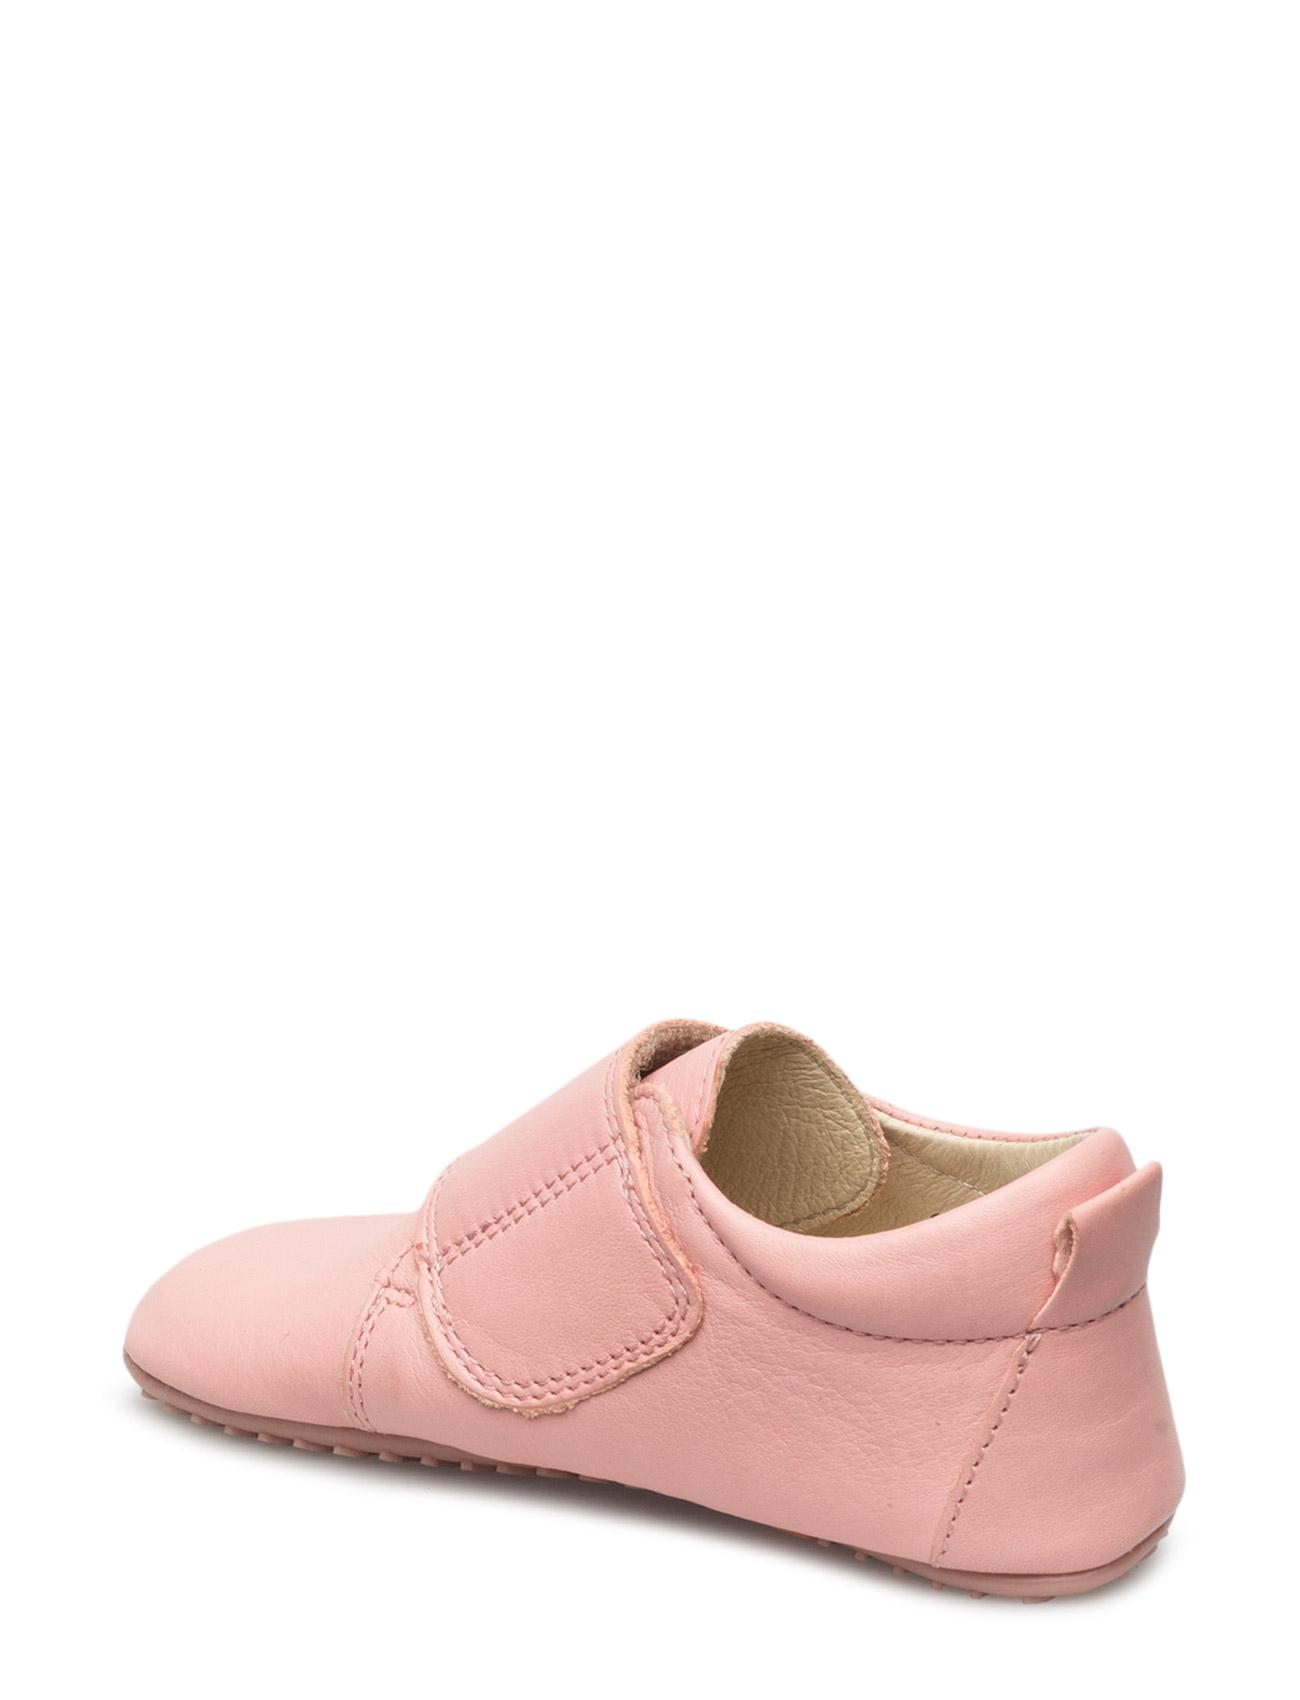 a99c84084645 Ecological Hand Made Baby Shoe Arauto RAP Sko   Sneakers til Børn i ...